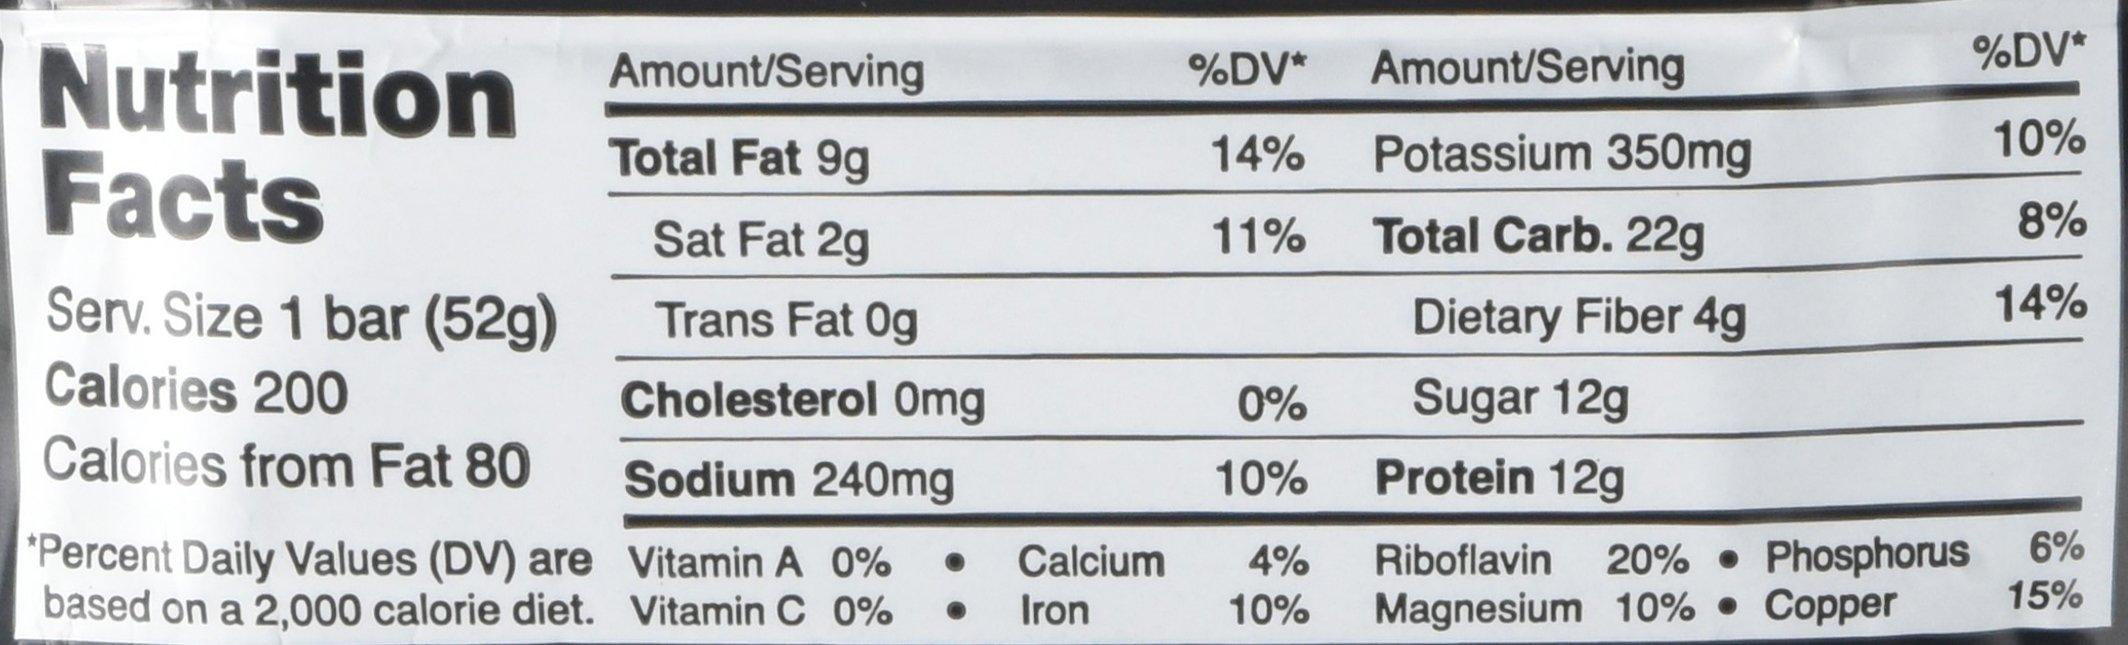 Rx Bar Chocolate Sea Salt, Protein Bar, 1.83 Oz, 12 Count by RXBAR (Image #2)